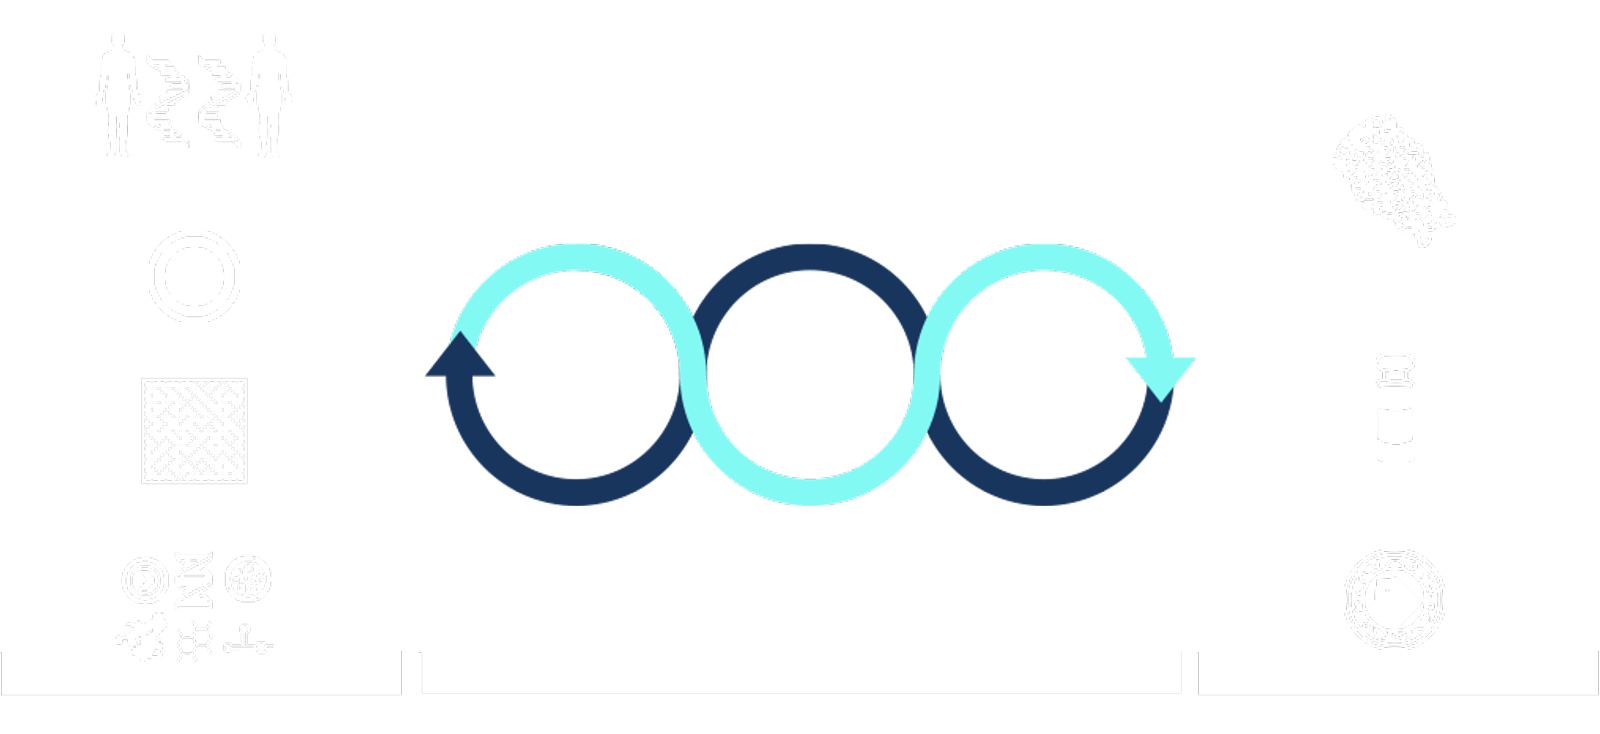 Chart For Data Input / Computational Model / Candidates